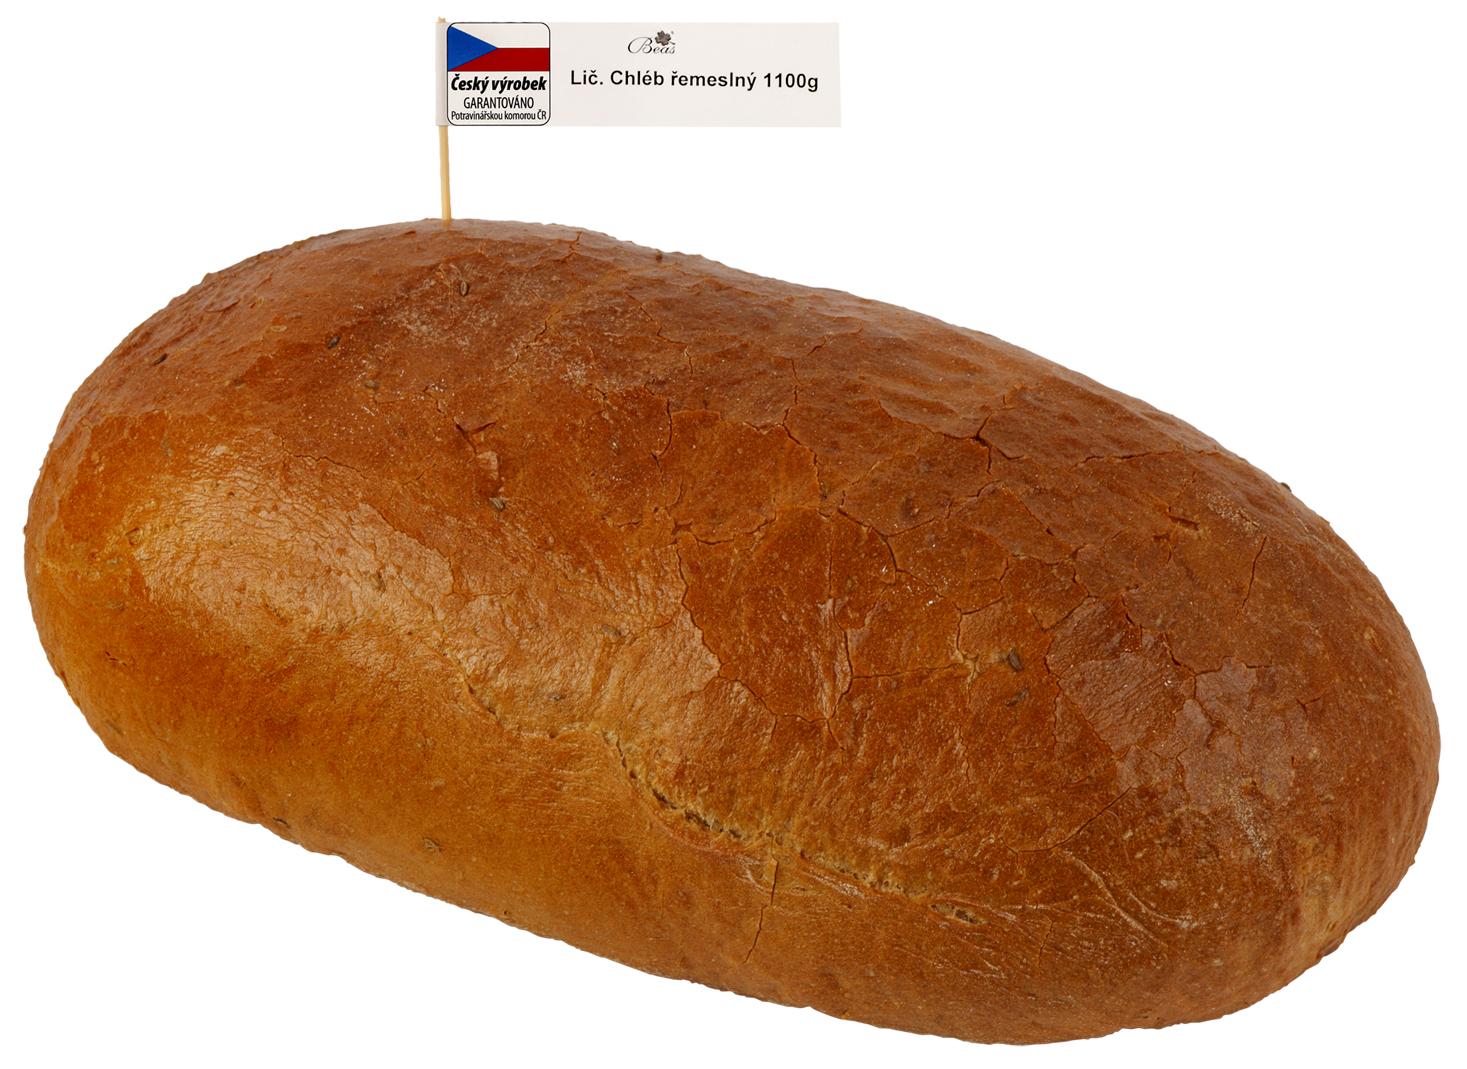 Značka Beas Chléb řemeslný 1100g